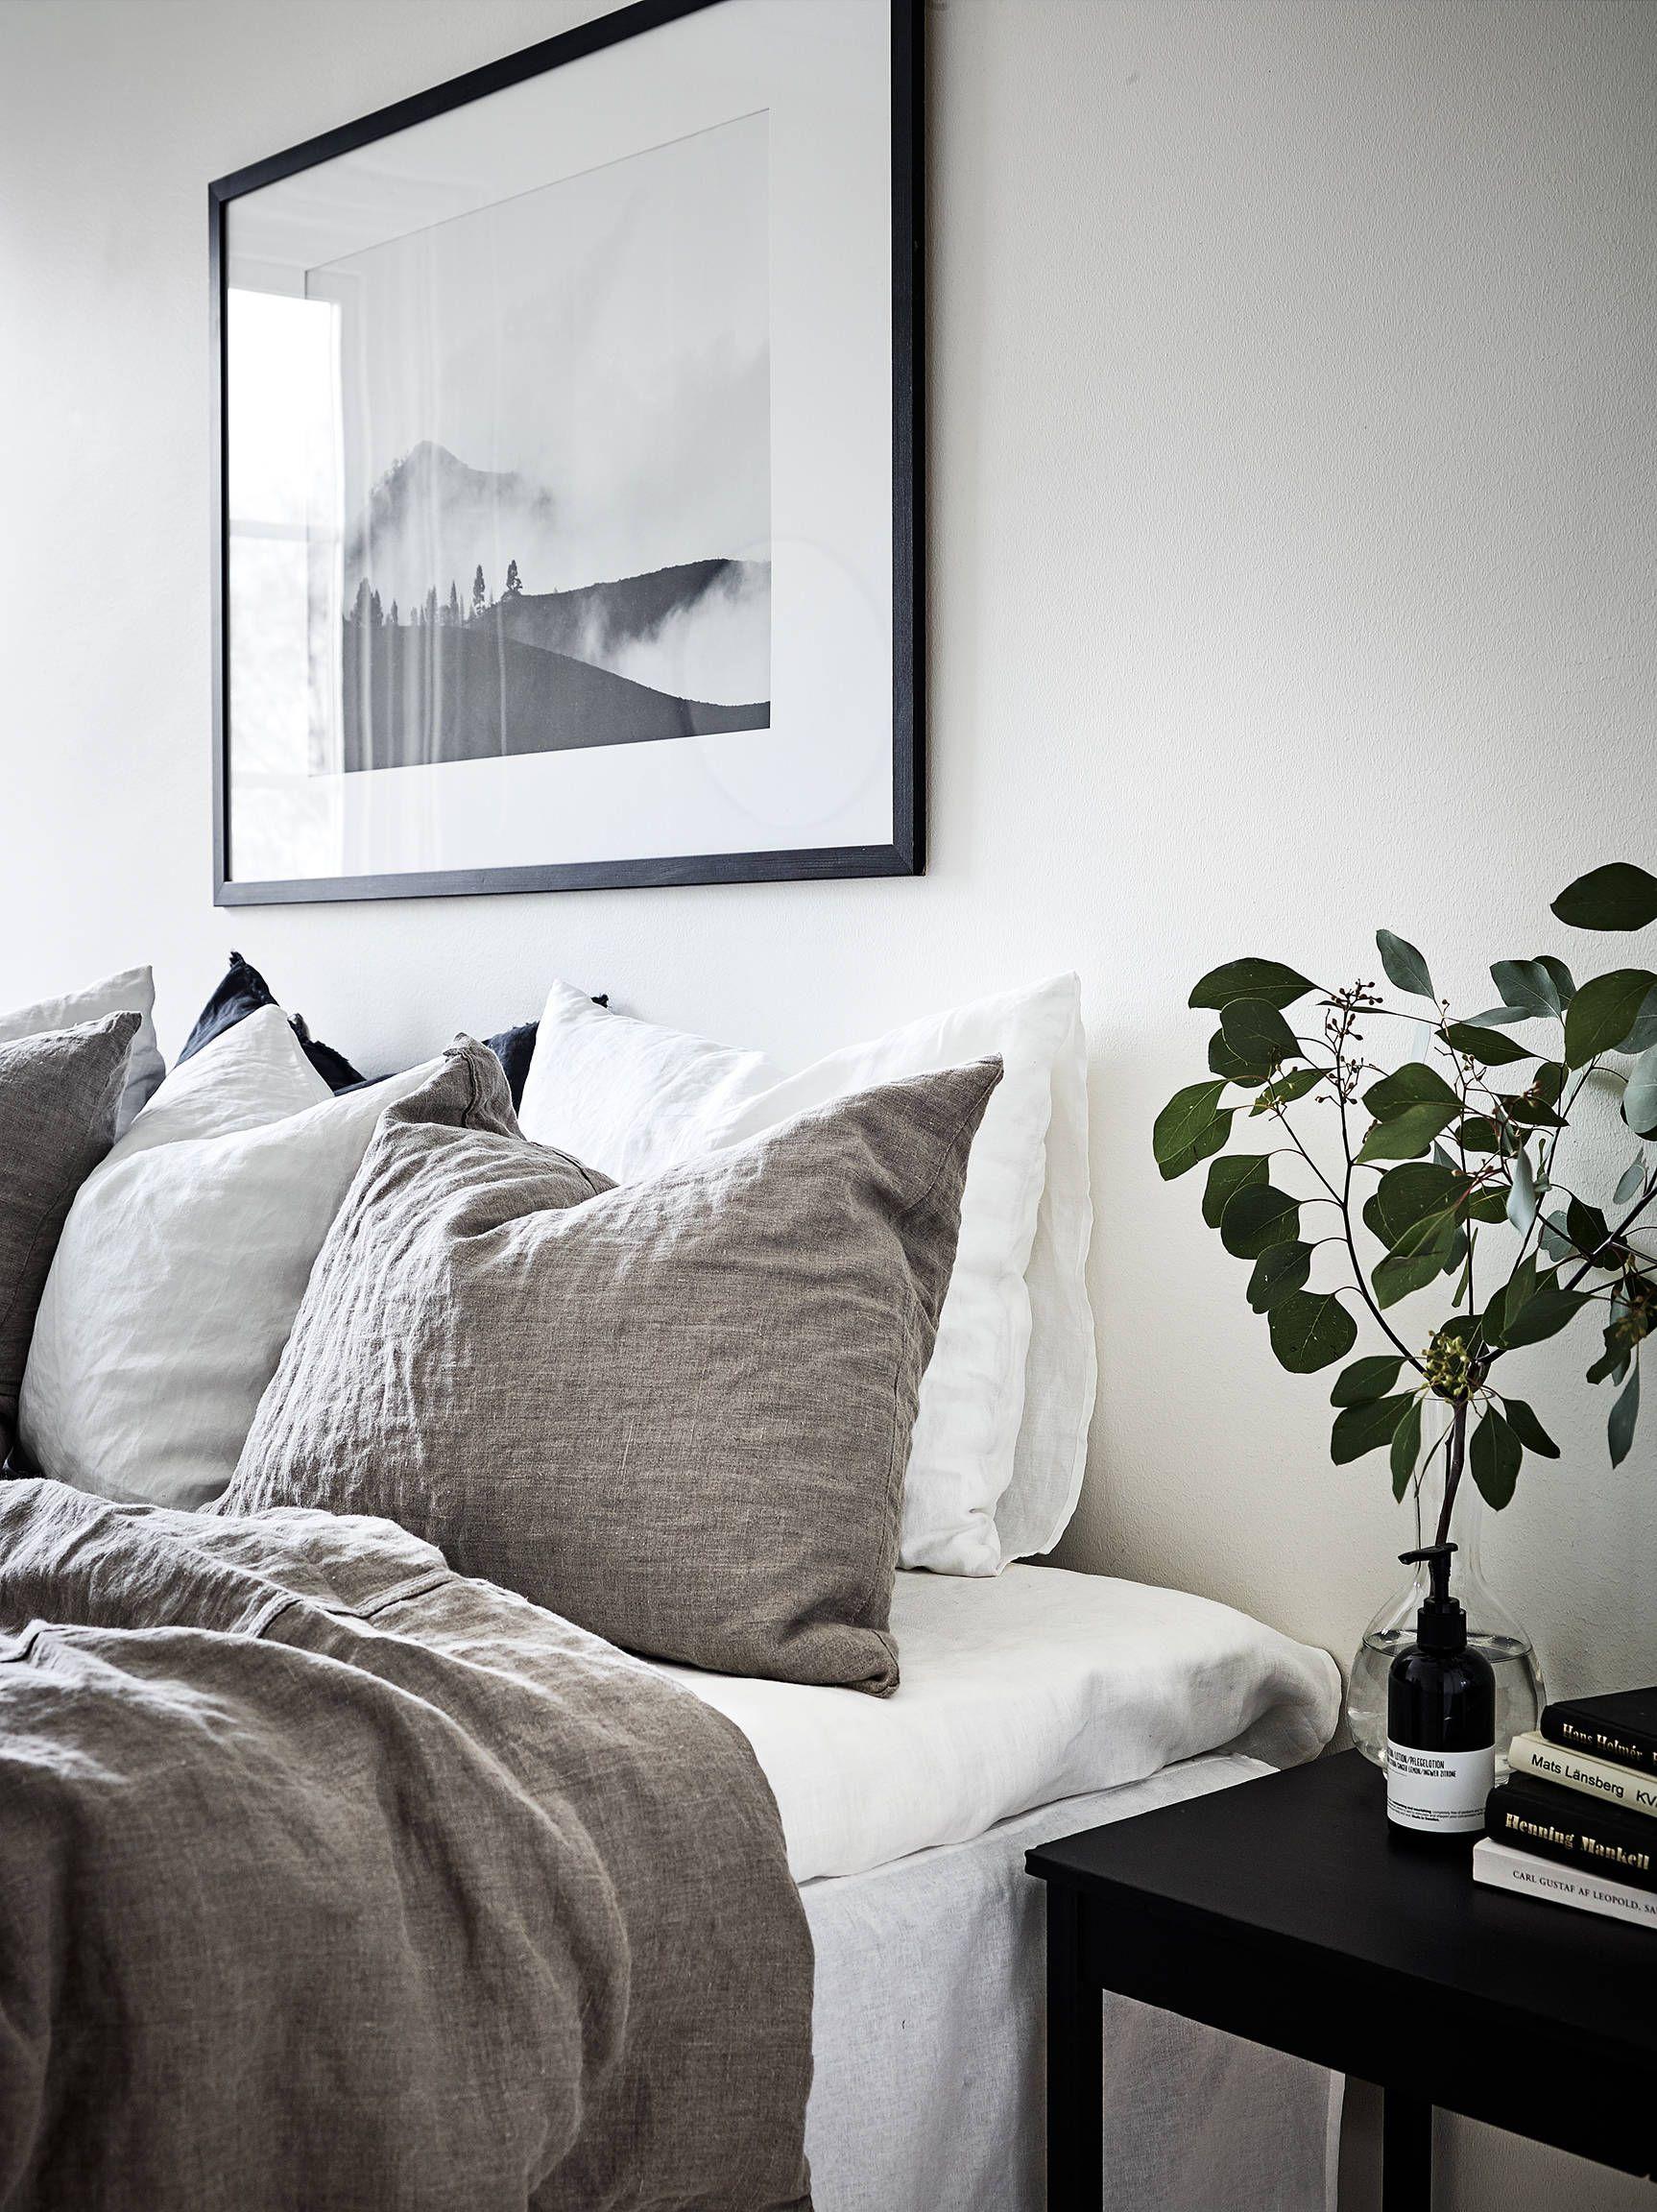 sfdecf9cc1ee4f549bc8b794c47ebb5157d raumgestaltung. Black Bedroom Furniture Sets. Home Design Ideas